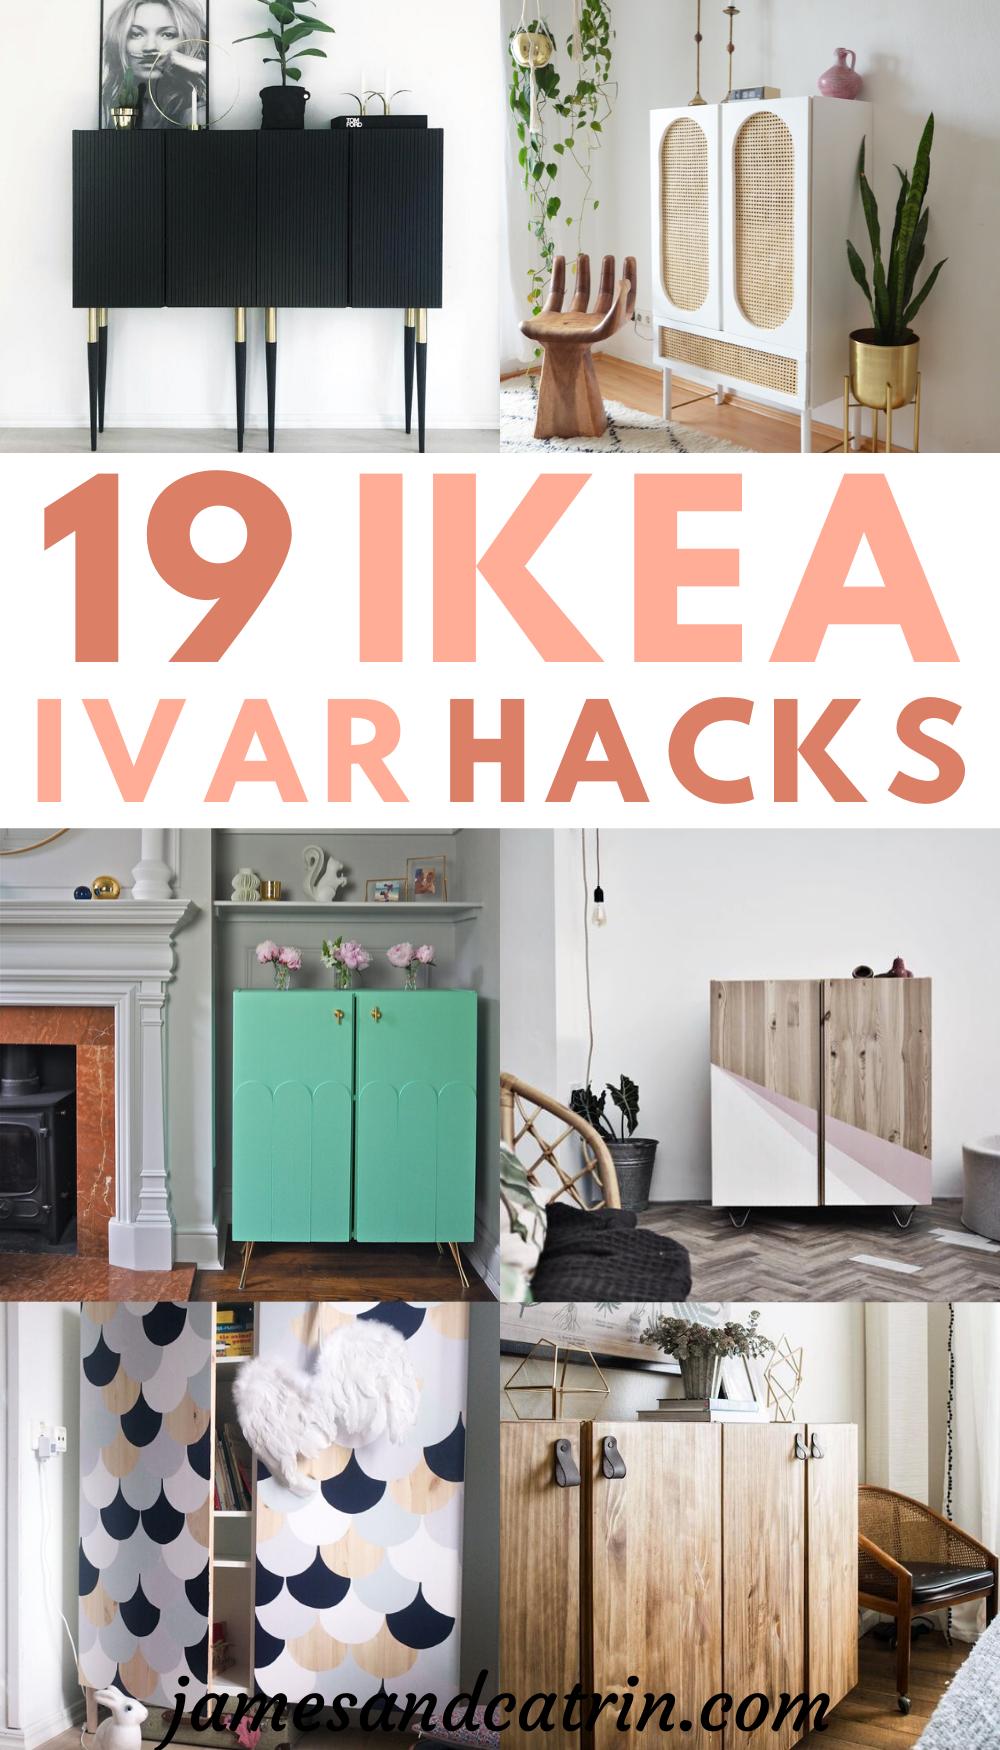 19 Ikea Ivar Hacks That Make Storage Beautiful In 2020 Ikea Ivar